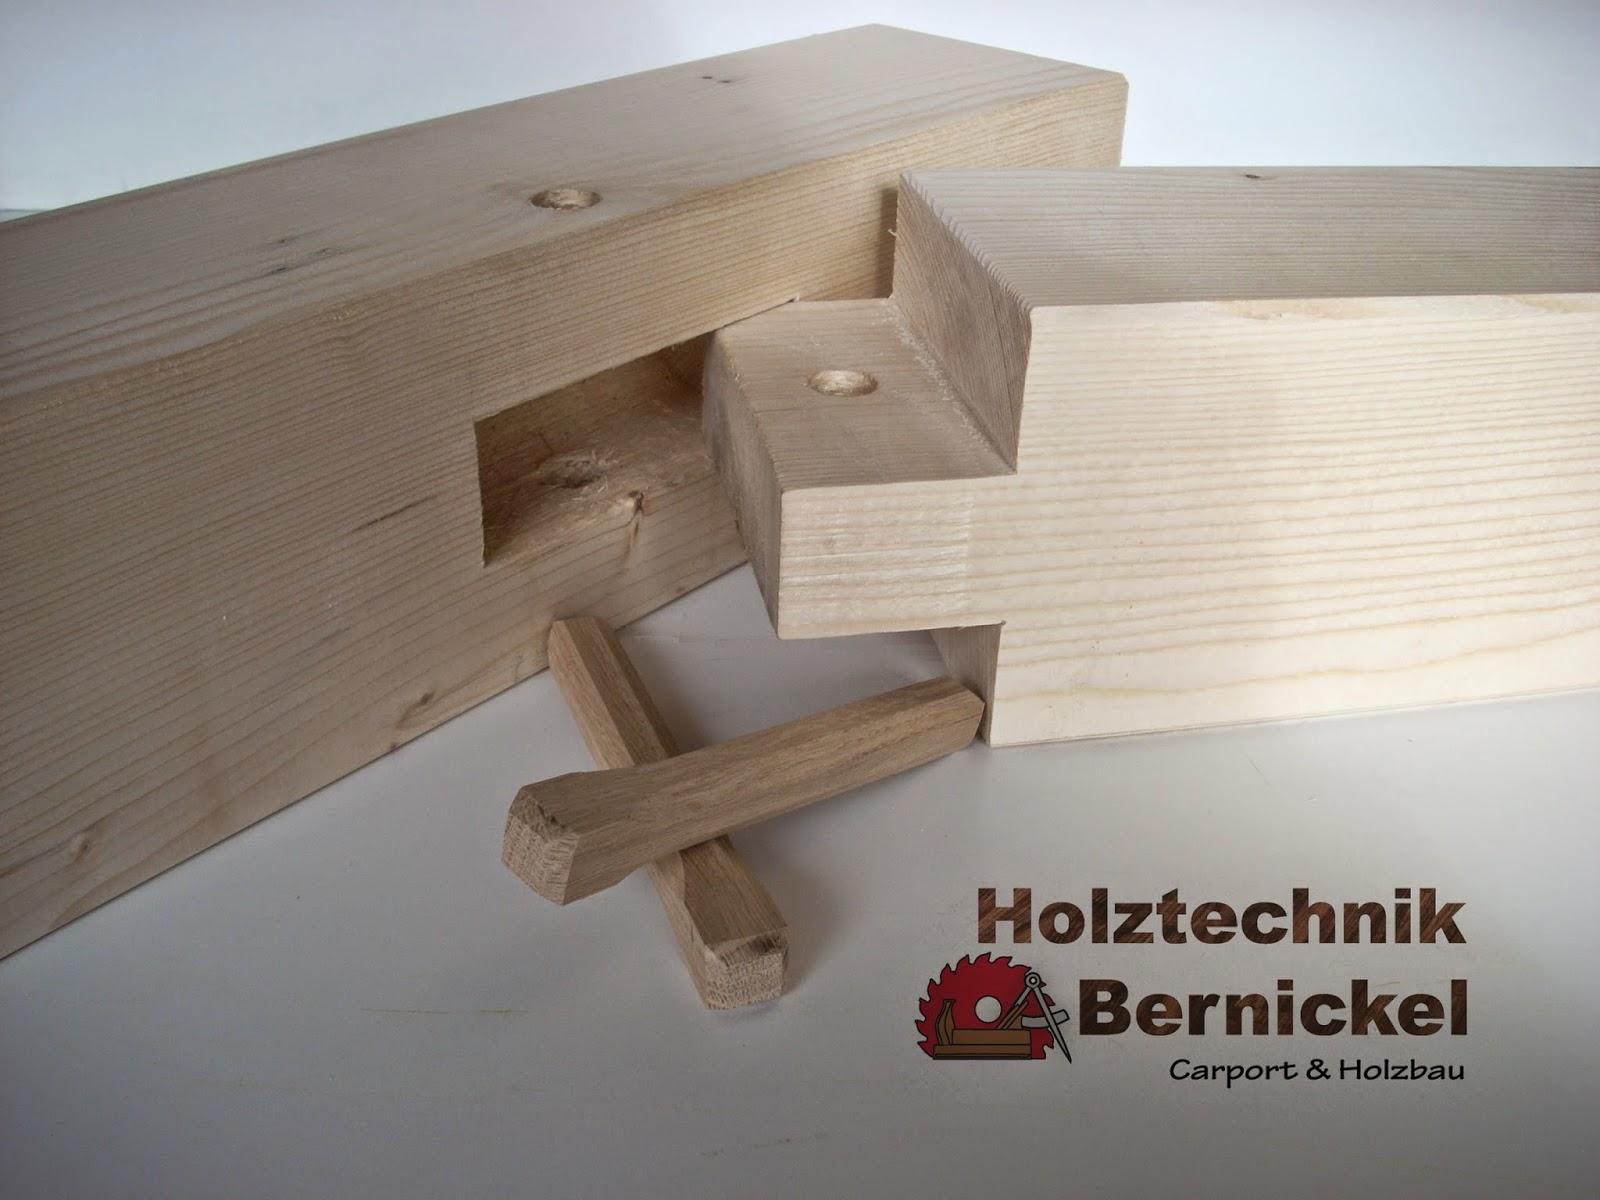 Holztechnik bernickel carport holzbau for Holzverbindungen zimmermann